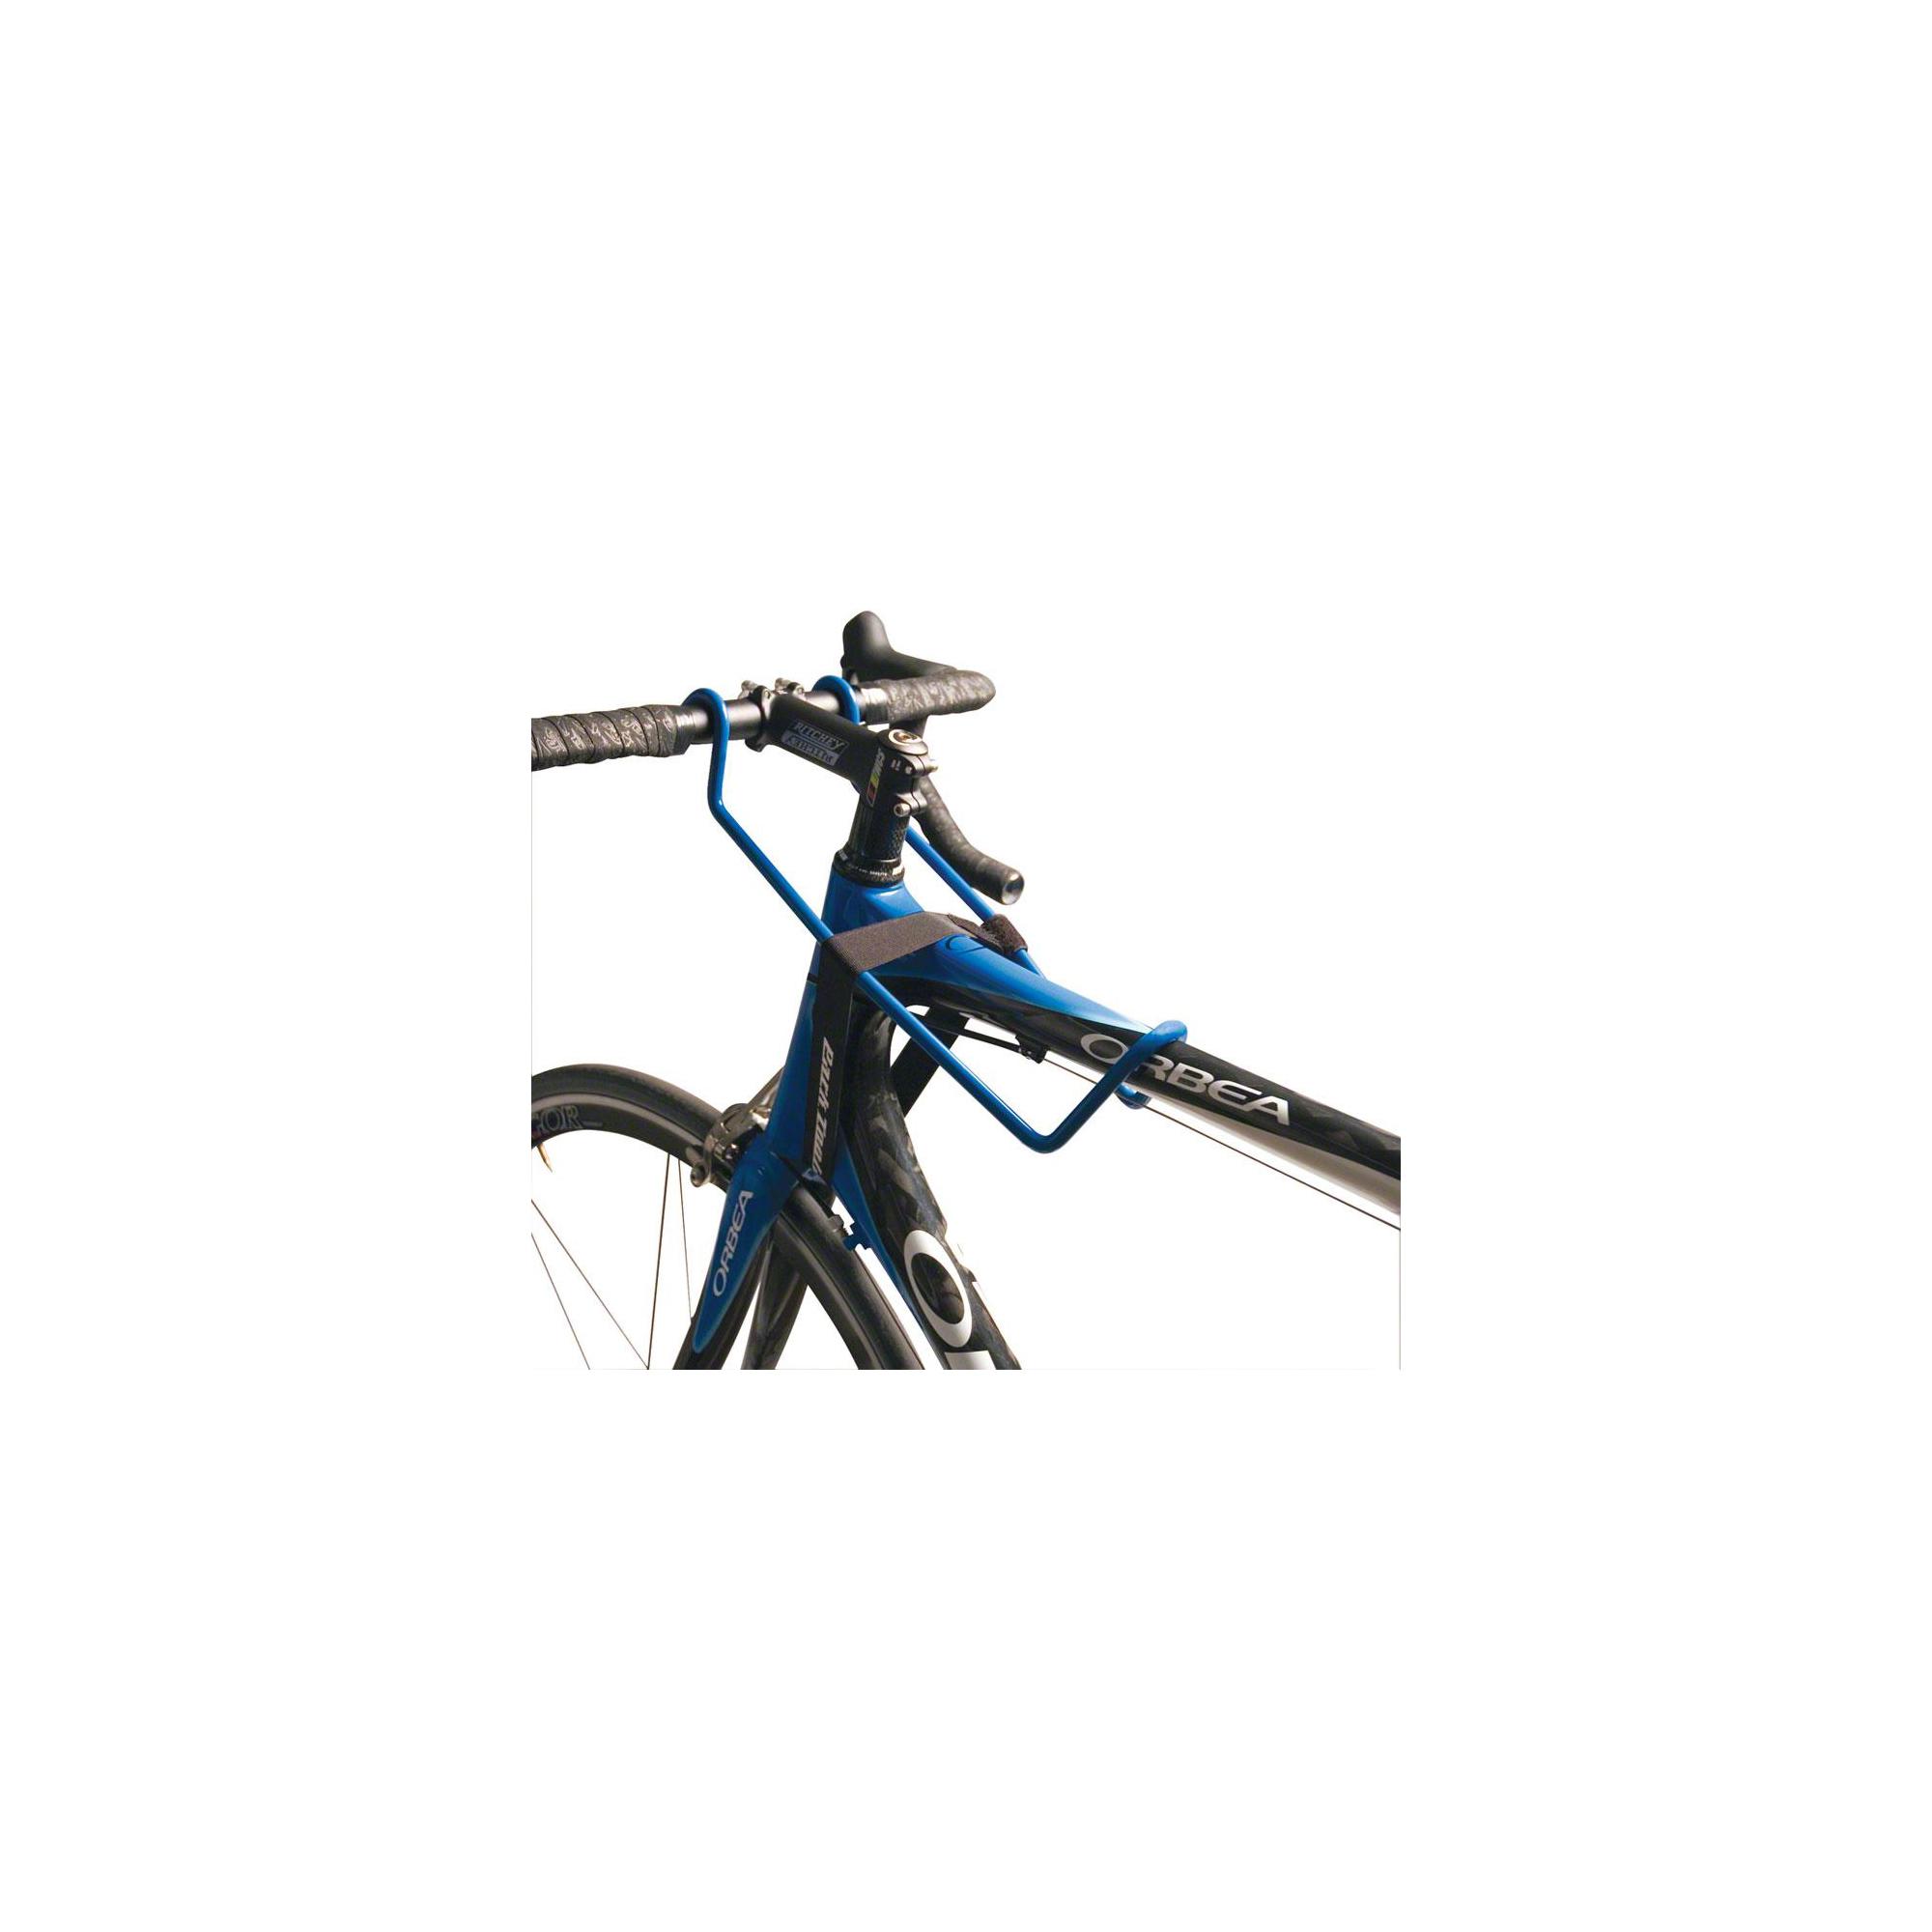 PARK TOOLS HBH-2 HANDLEBAR HOLDER BICYCLE TOOL